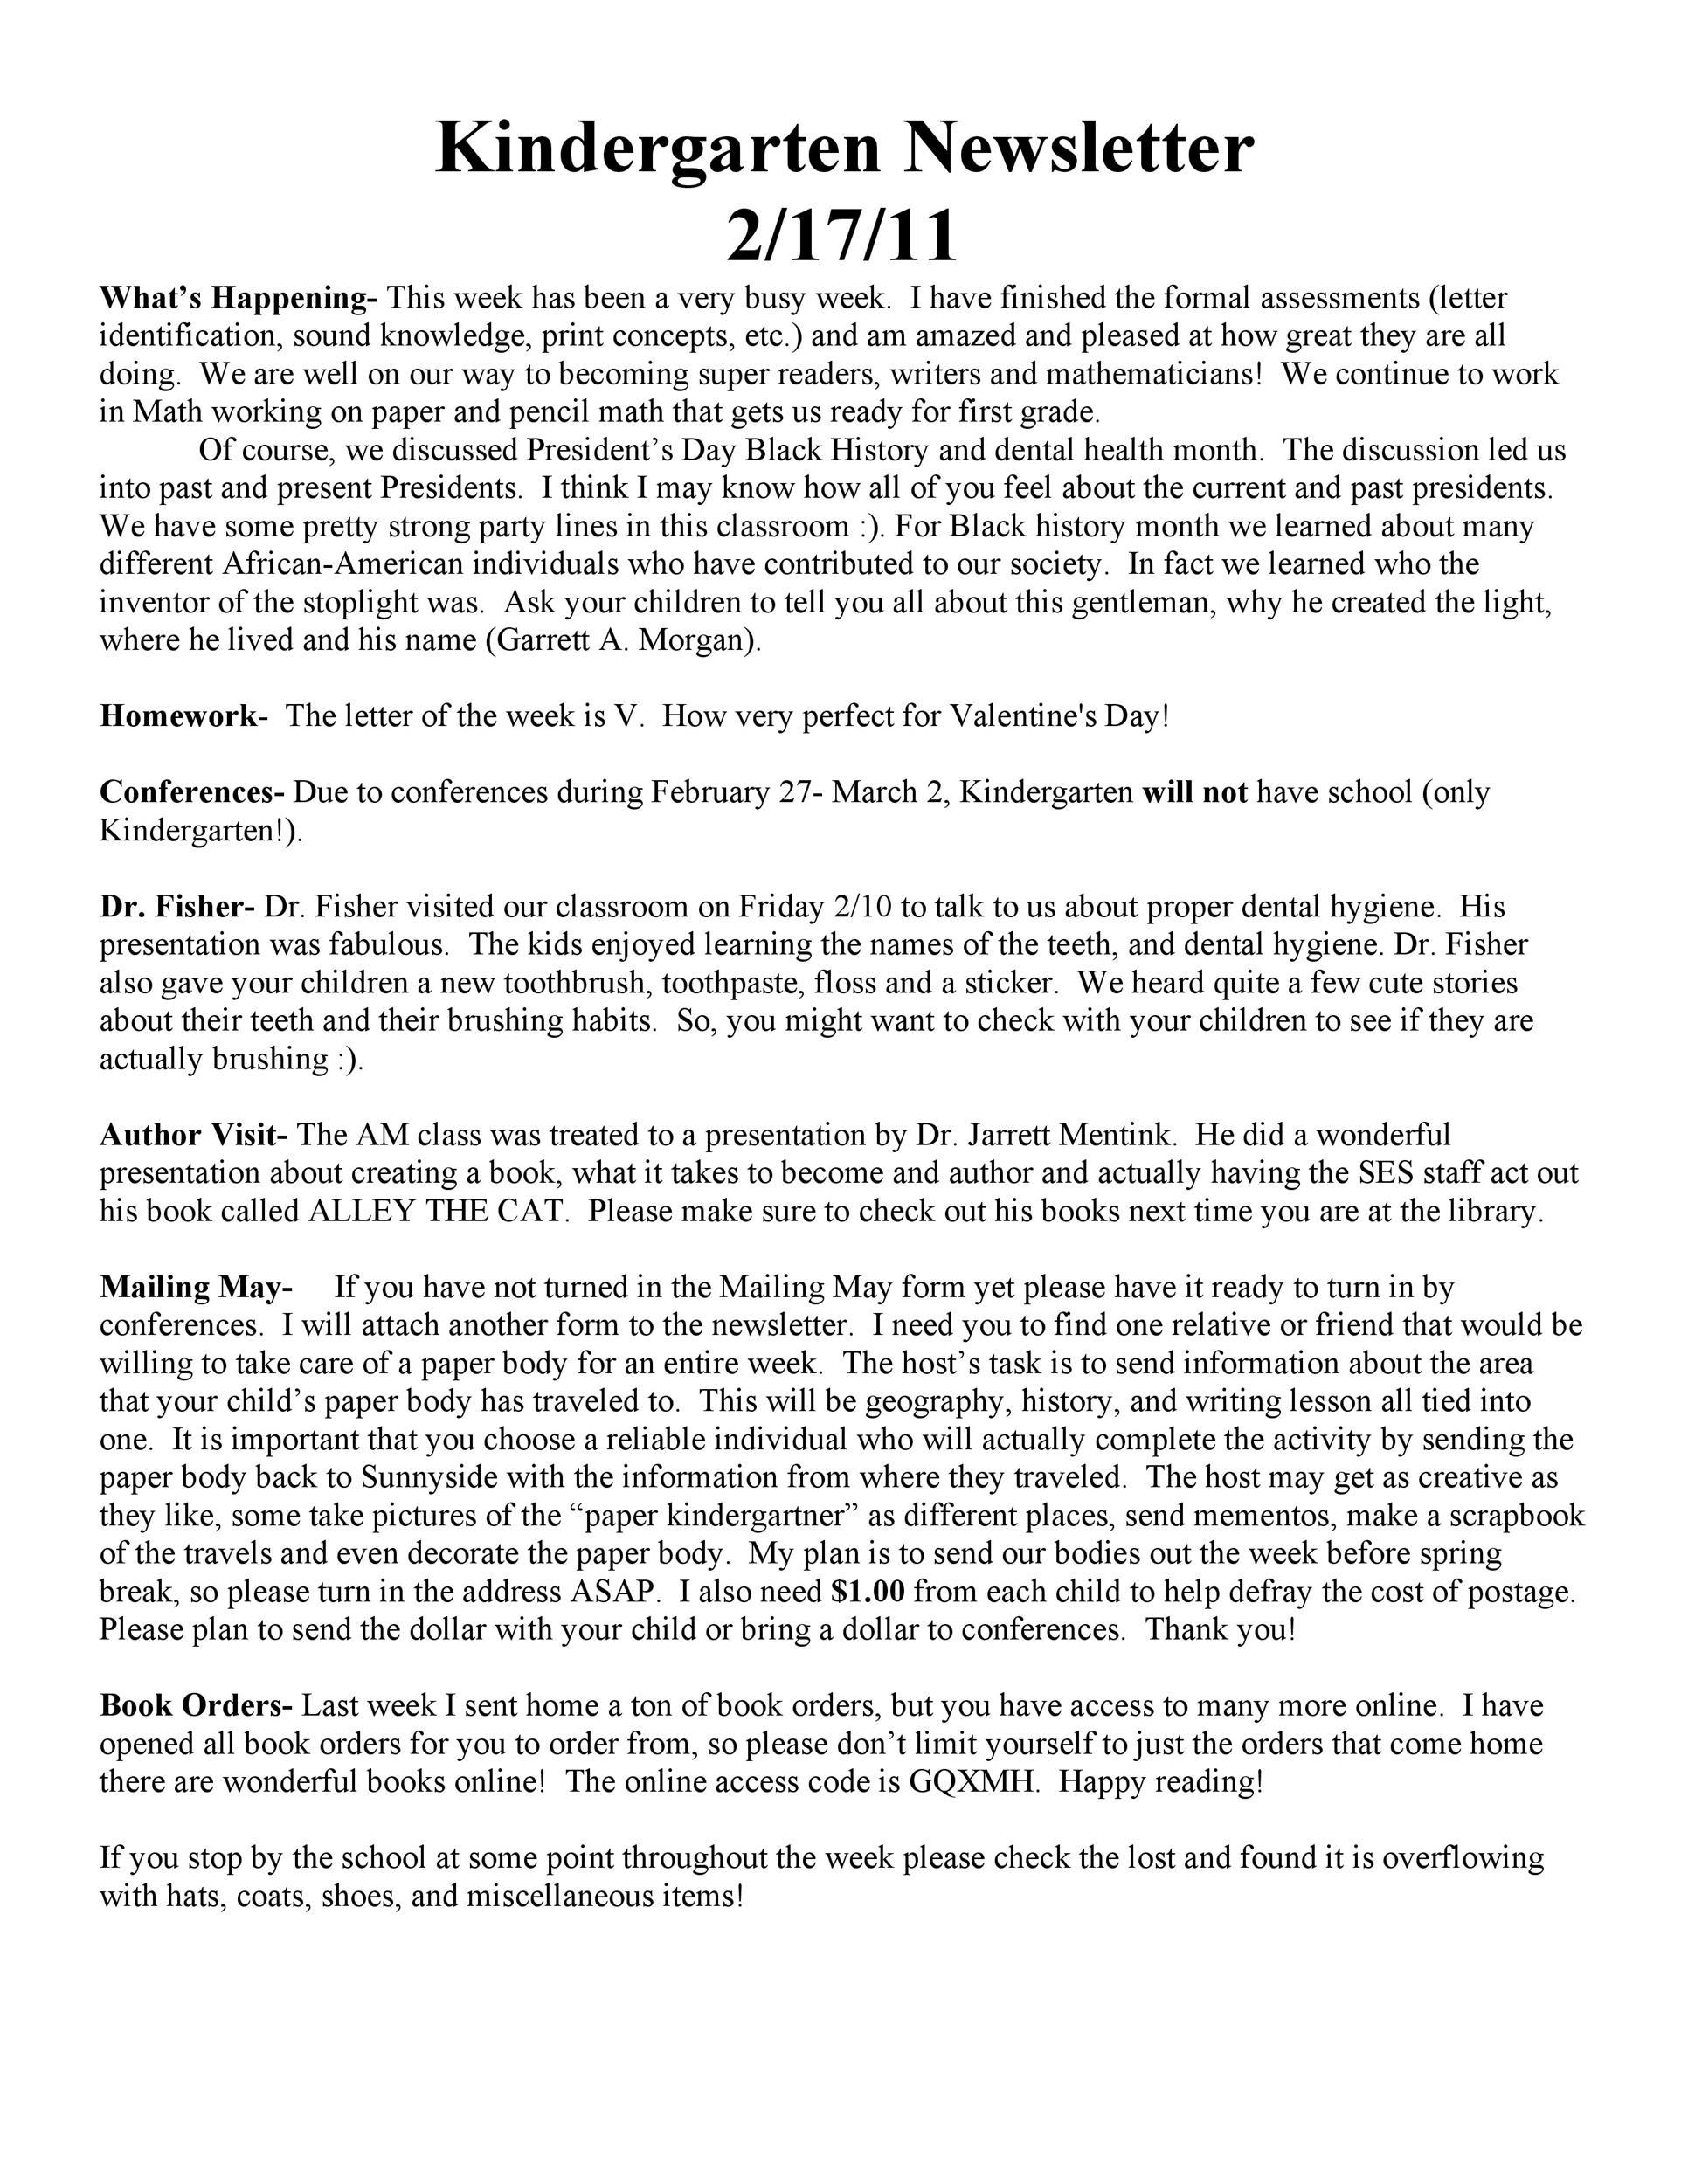 Free preschool newsletter template 11